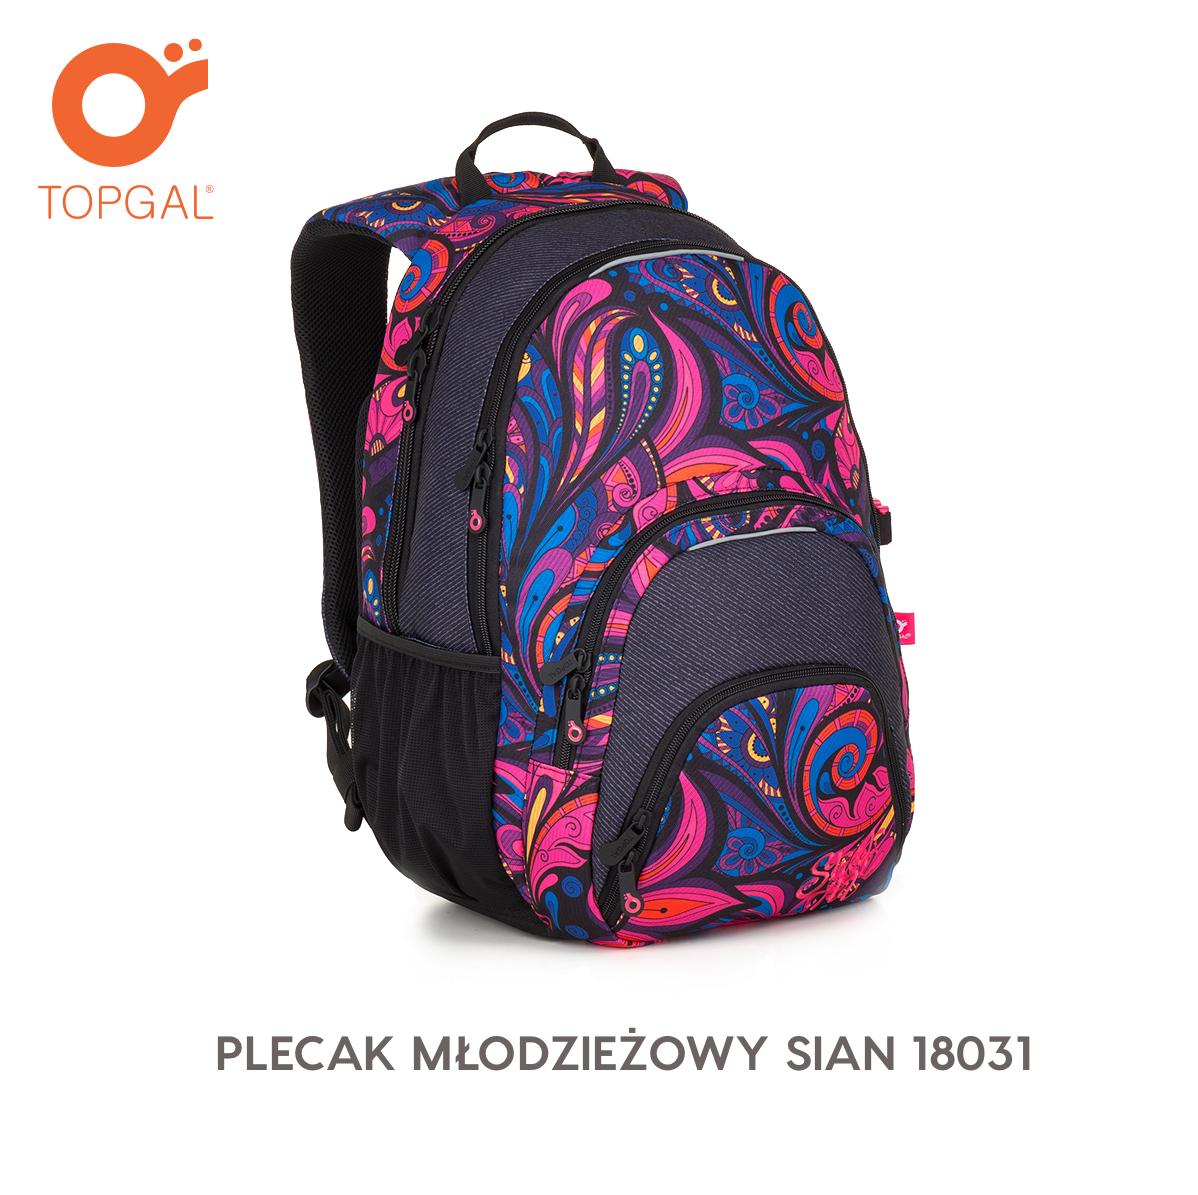 Plecak Mlodziezowy Sian 18031 Bags Backpacks Fashion